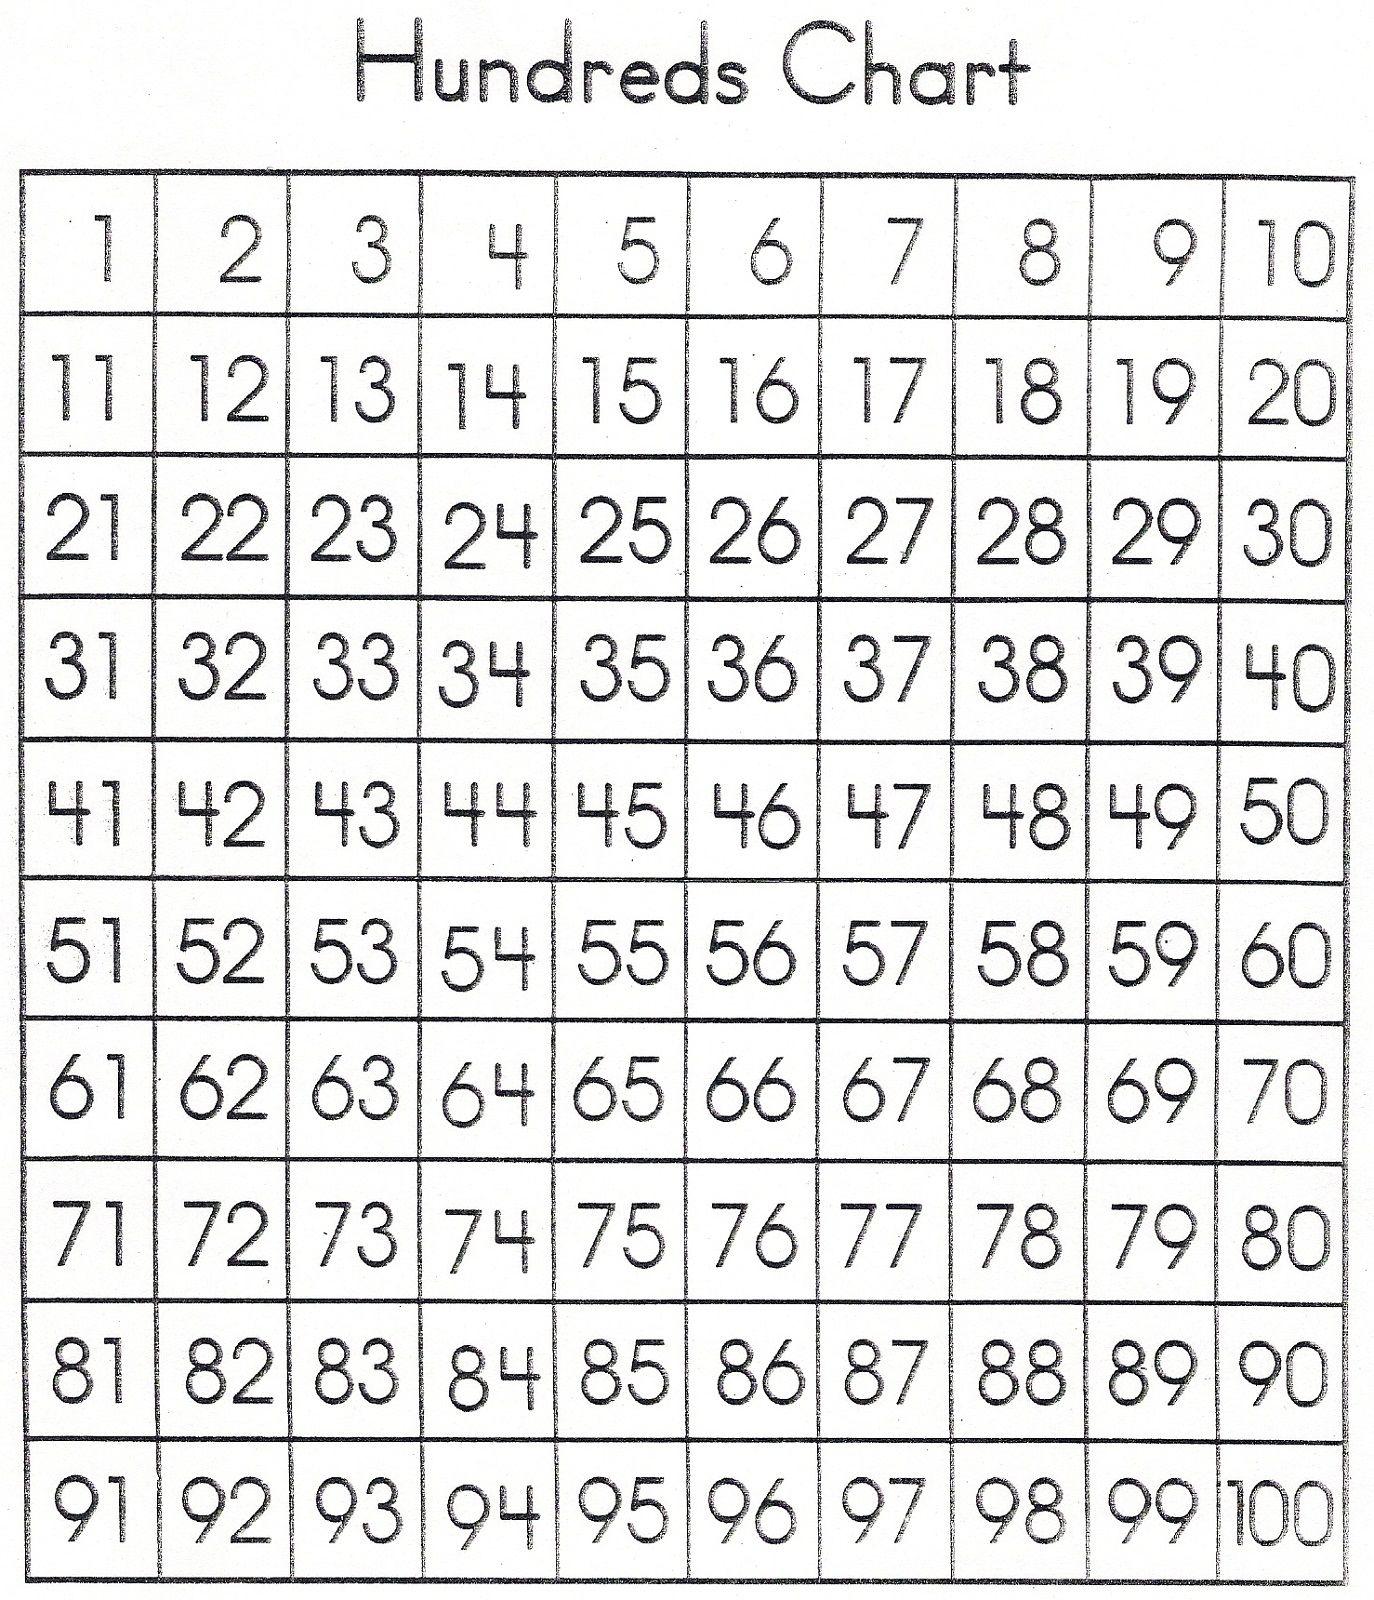 One Hundred Chart Worksheet   Kids Activities